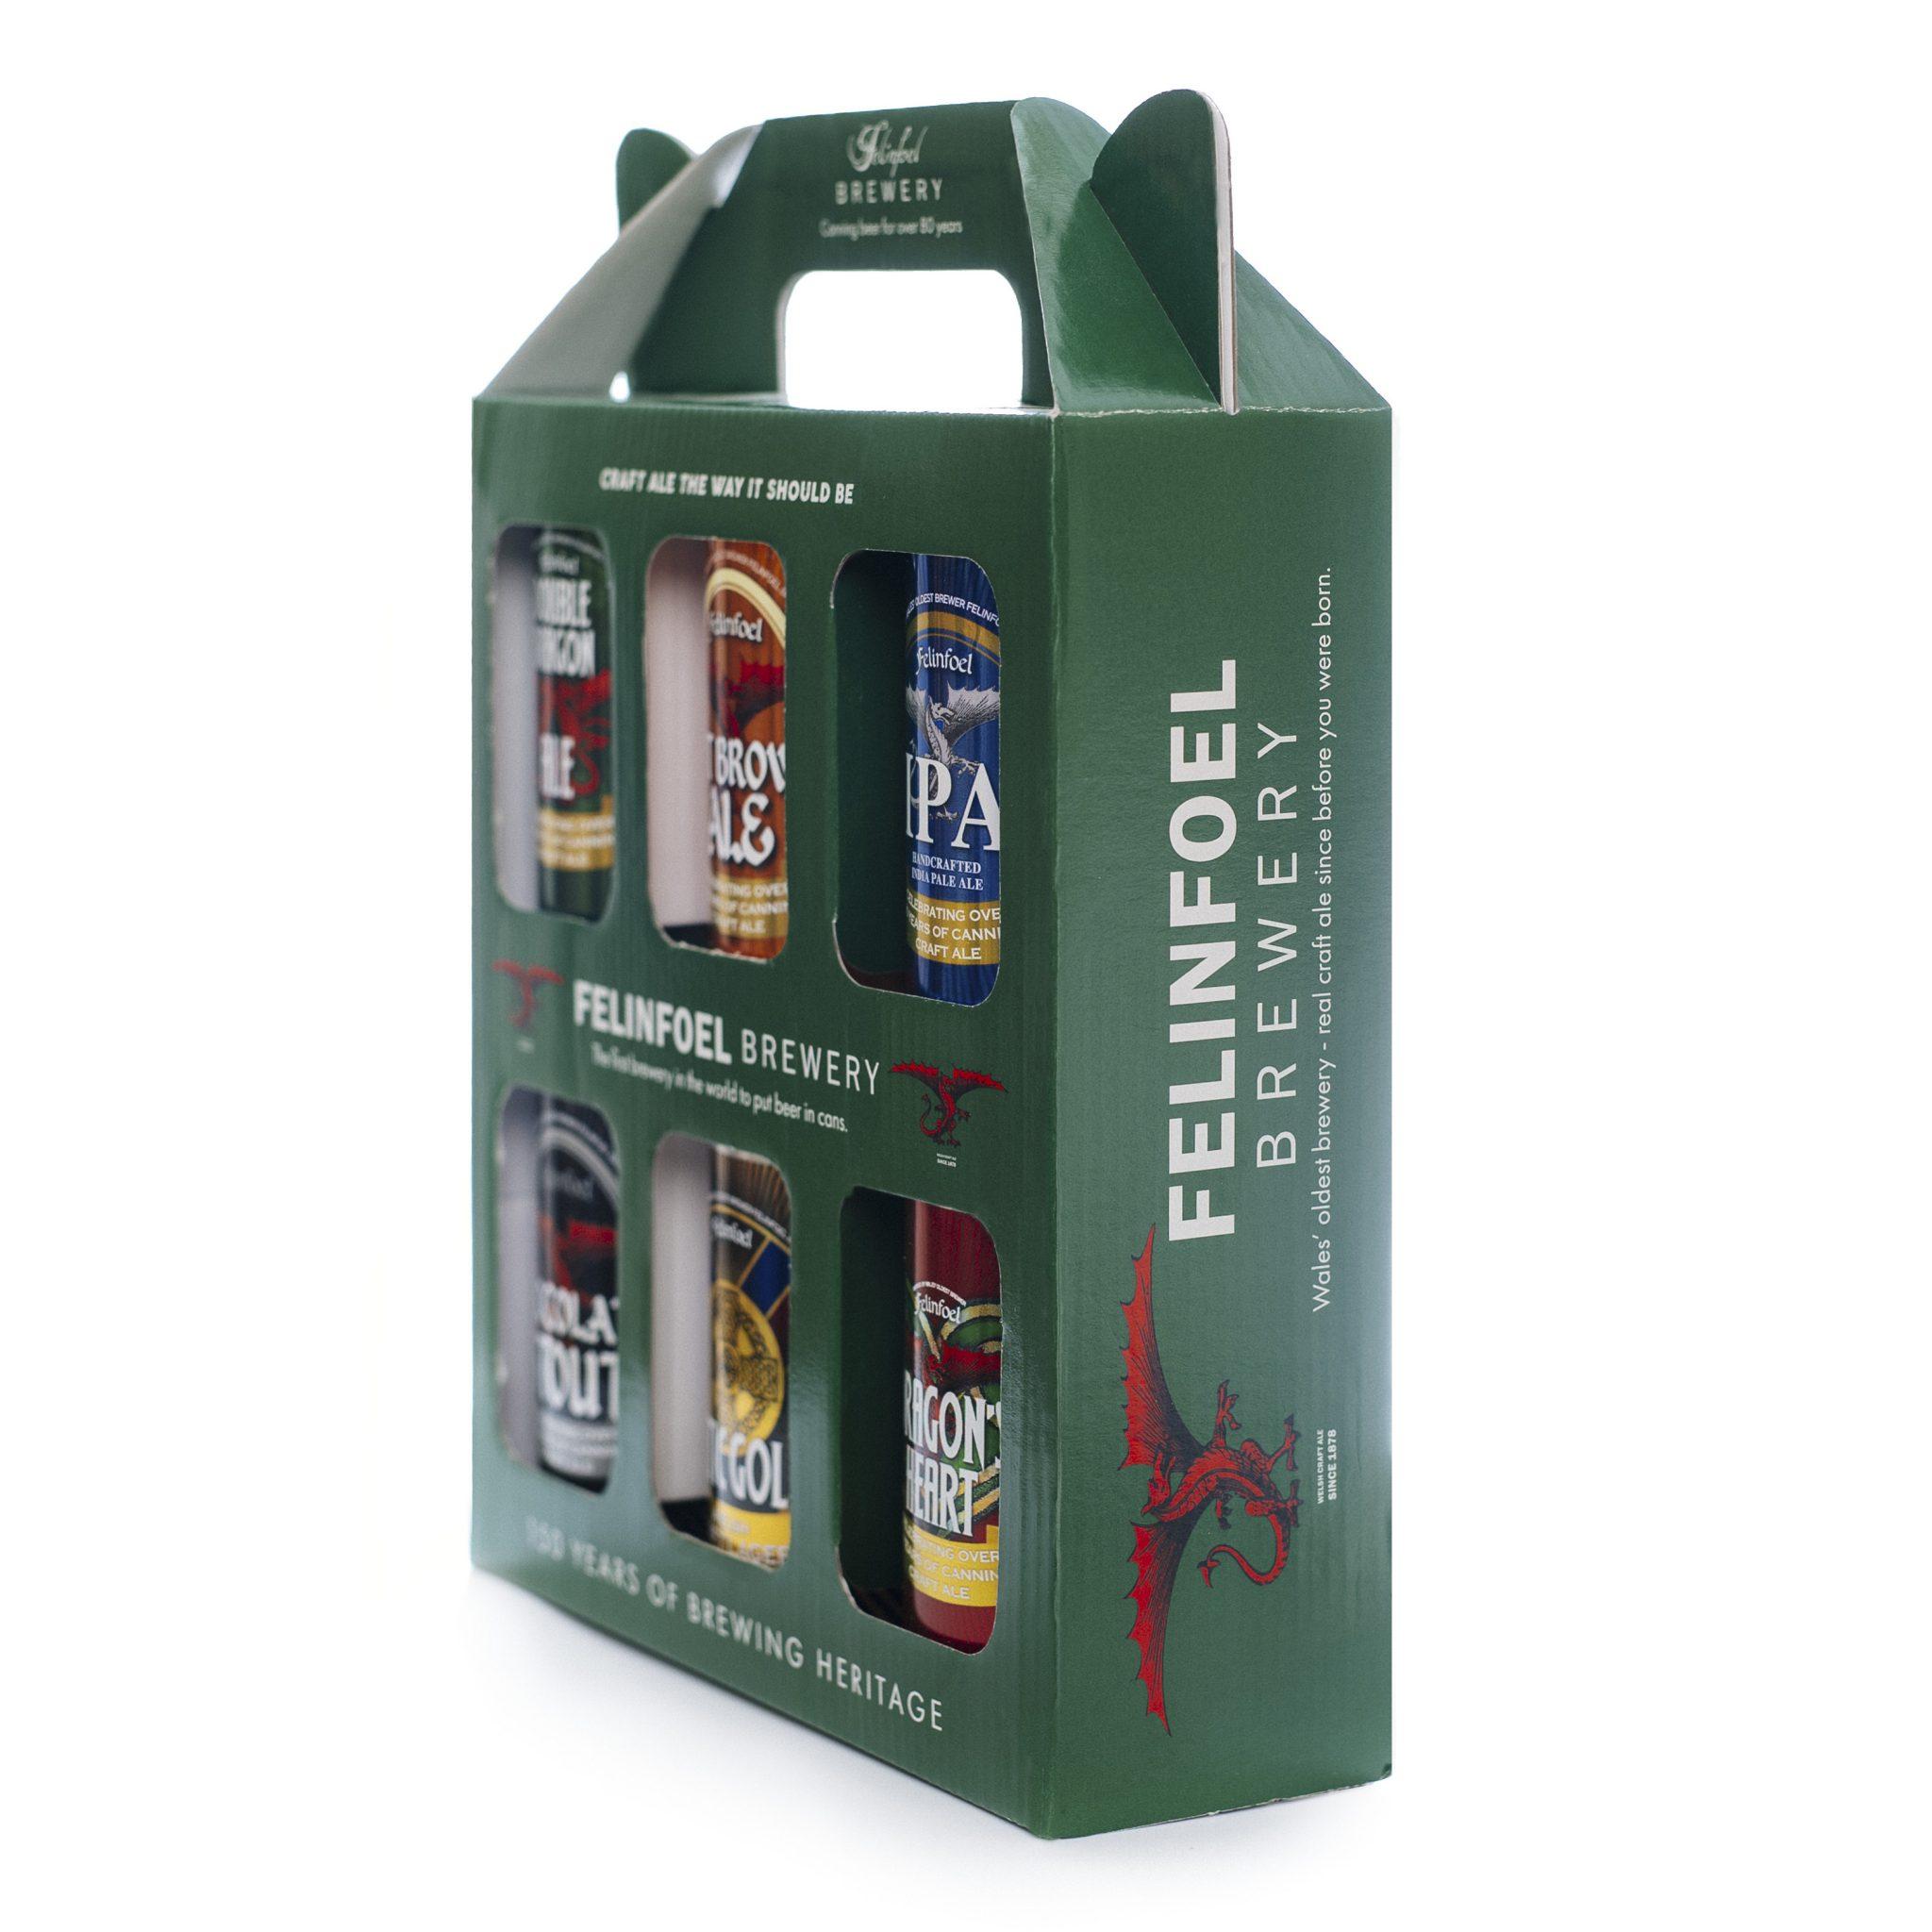 Craft beer gift box - Felinfoel Craft Ale Gift Box